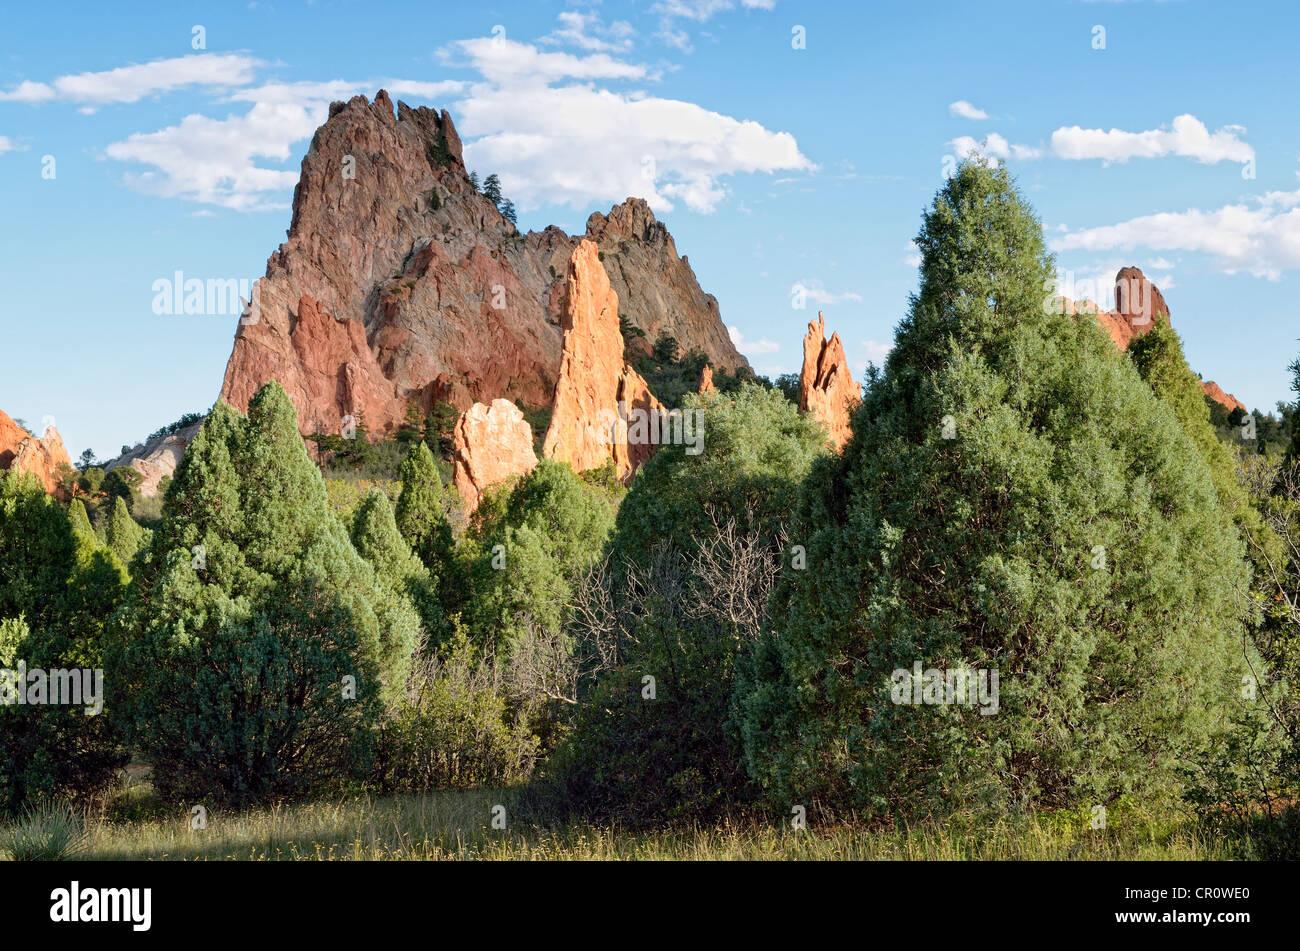 Cathedral Rock or Gray Rock, Garden of the Gods, red sandstone, Colorado Springs, Colorado, USA - Stock Image